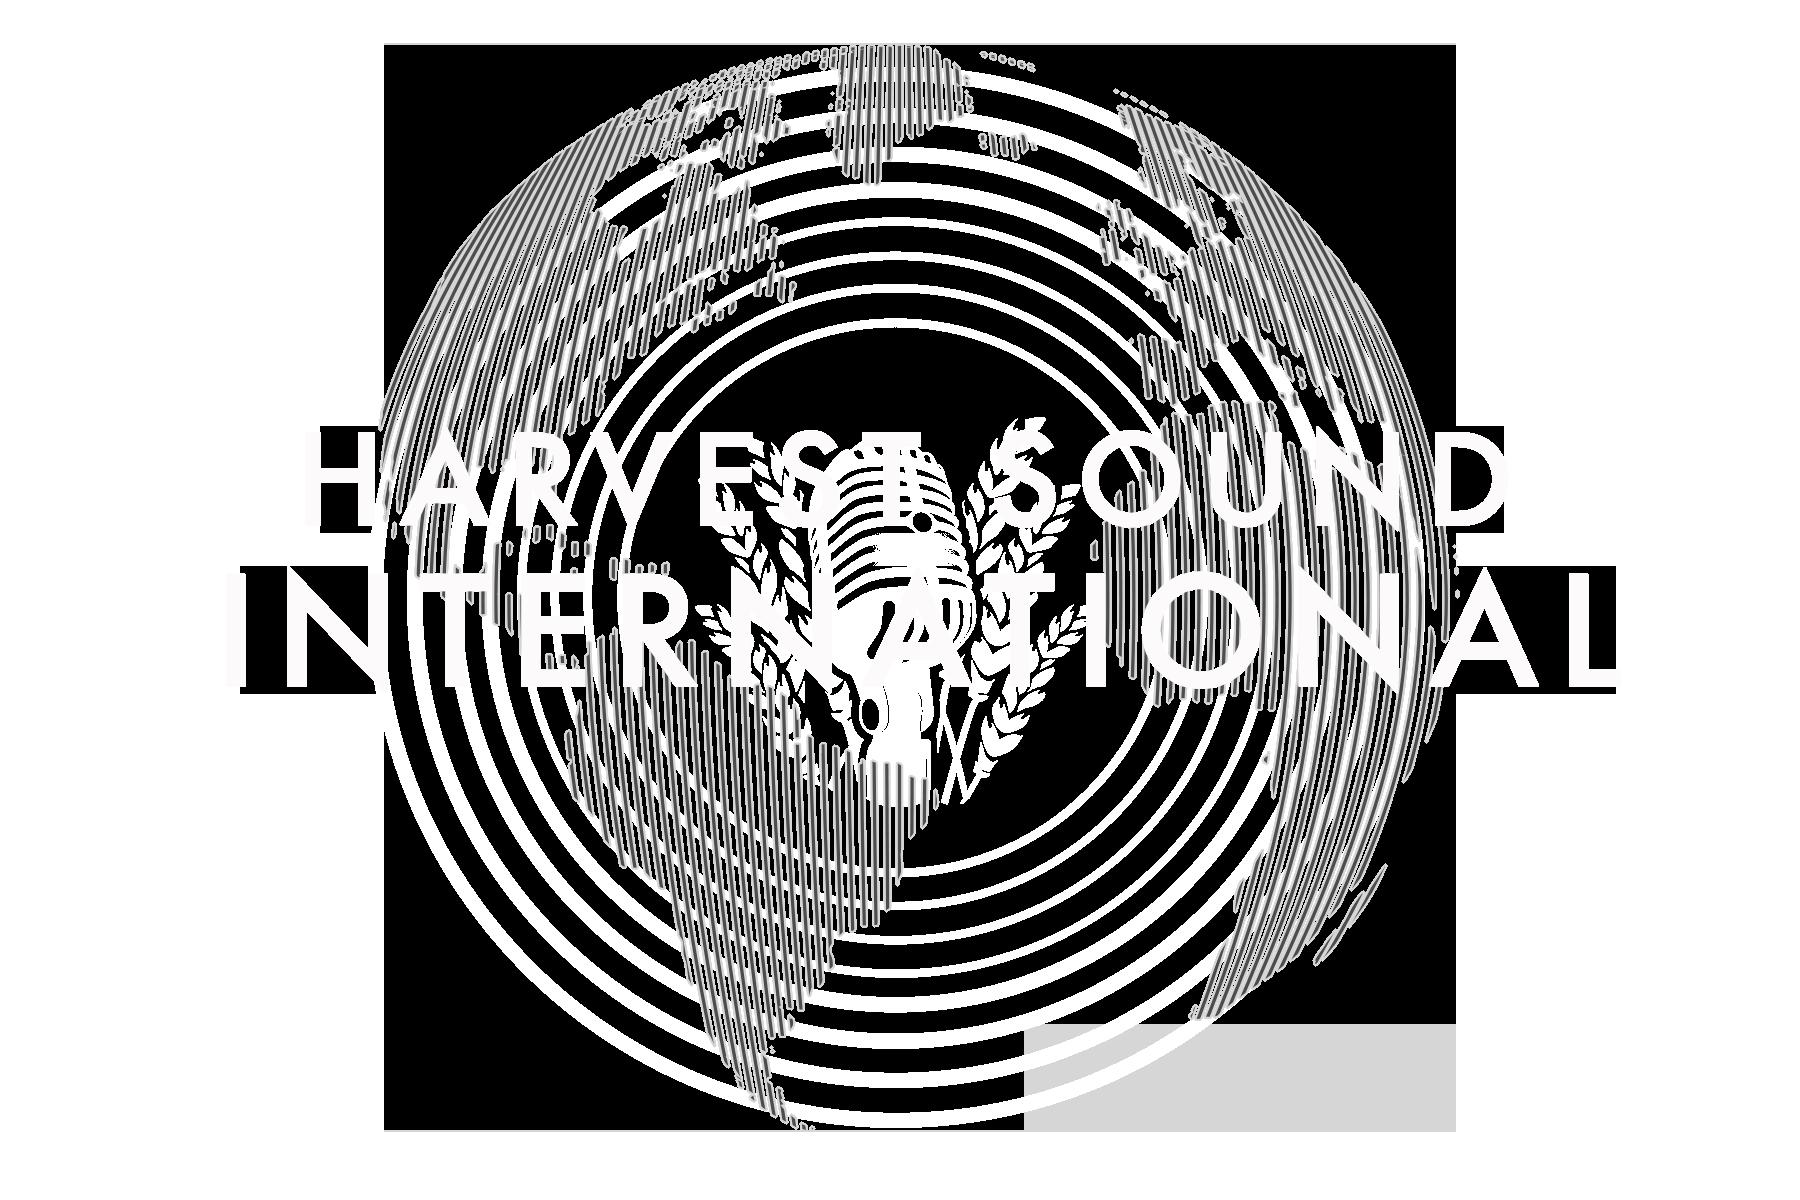 WORLD Harvest Sound International  copy.png